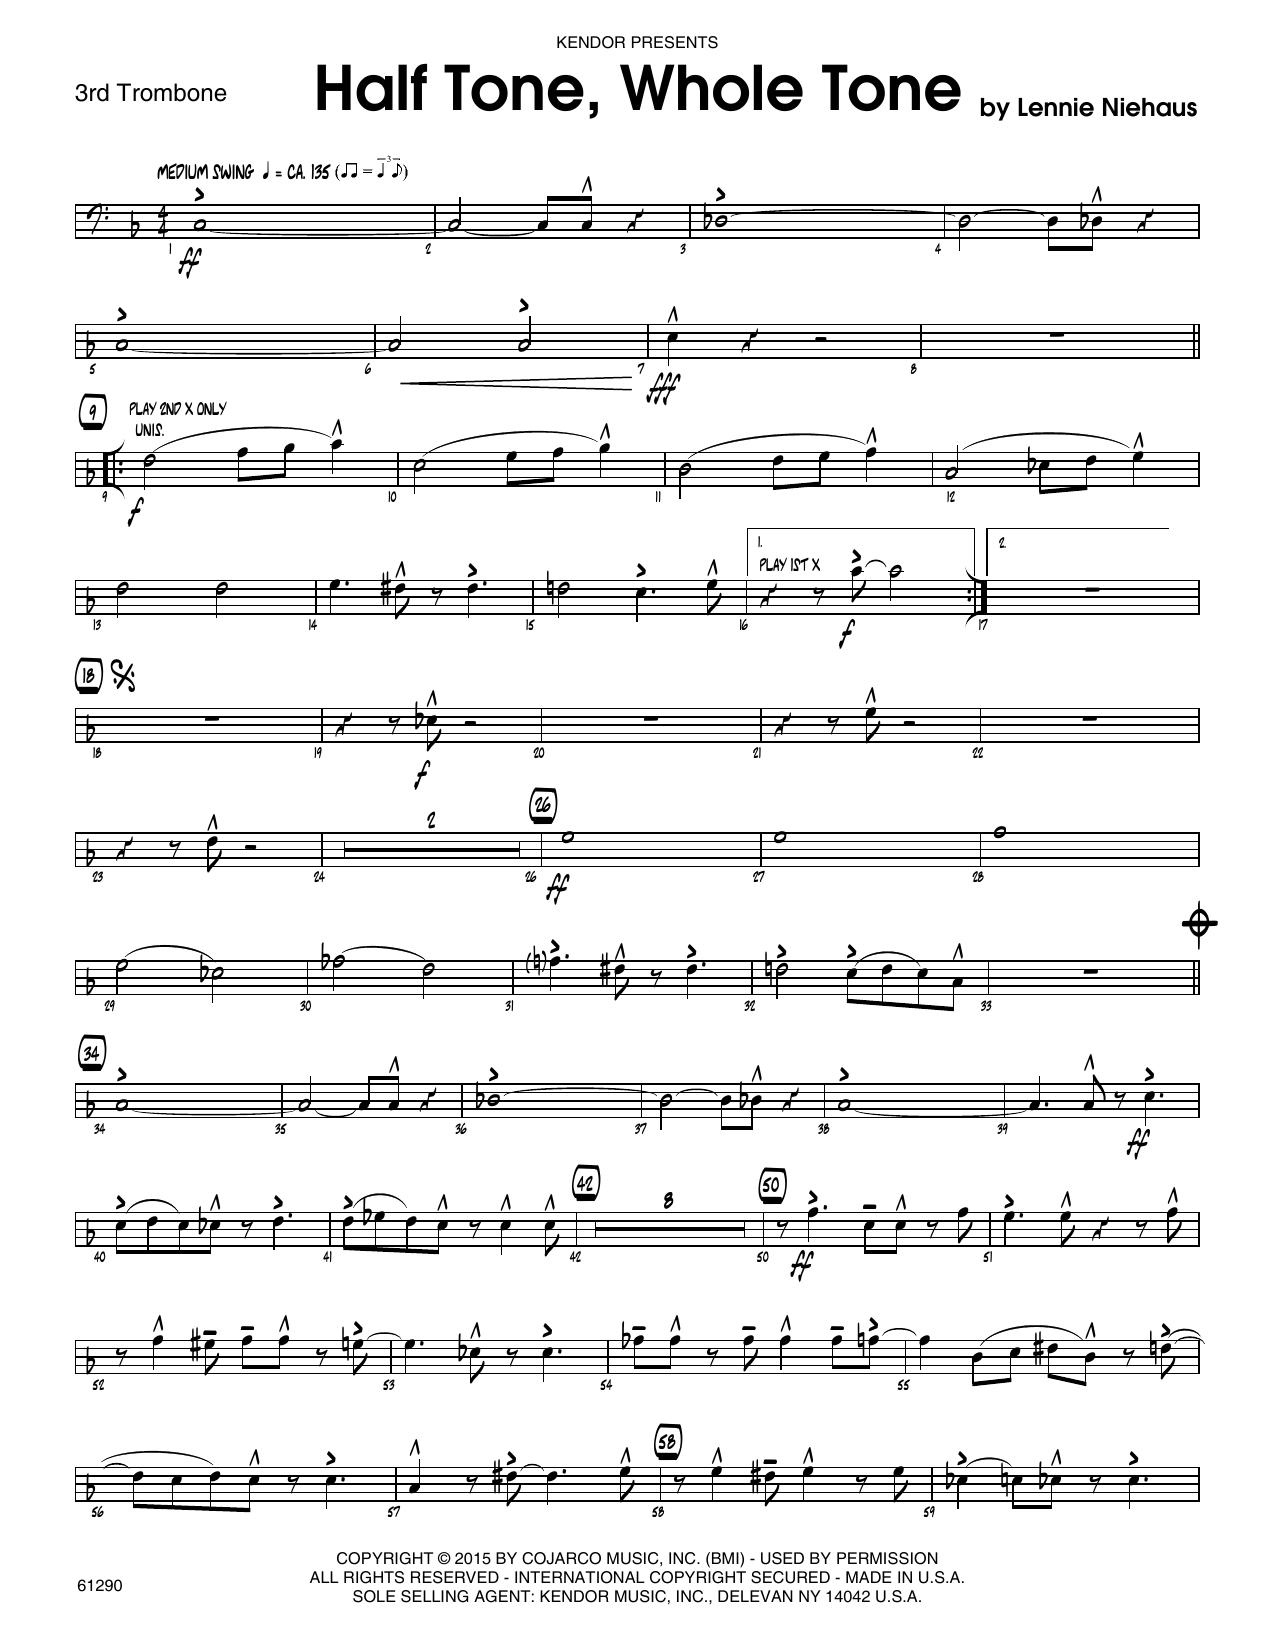 Half Tone, Whole Tone - 3rd Trombone Sheet Music